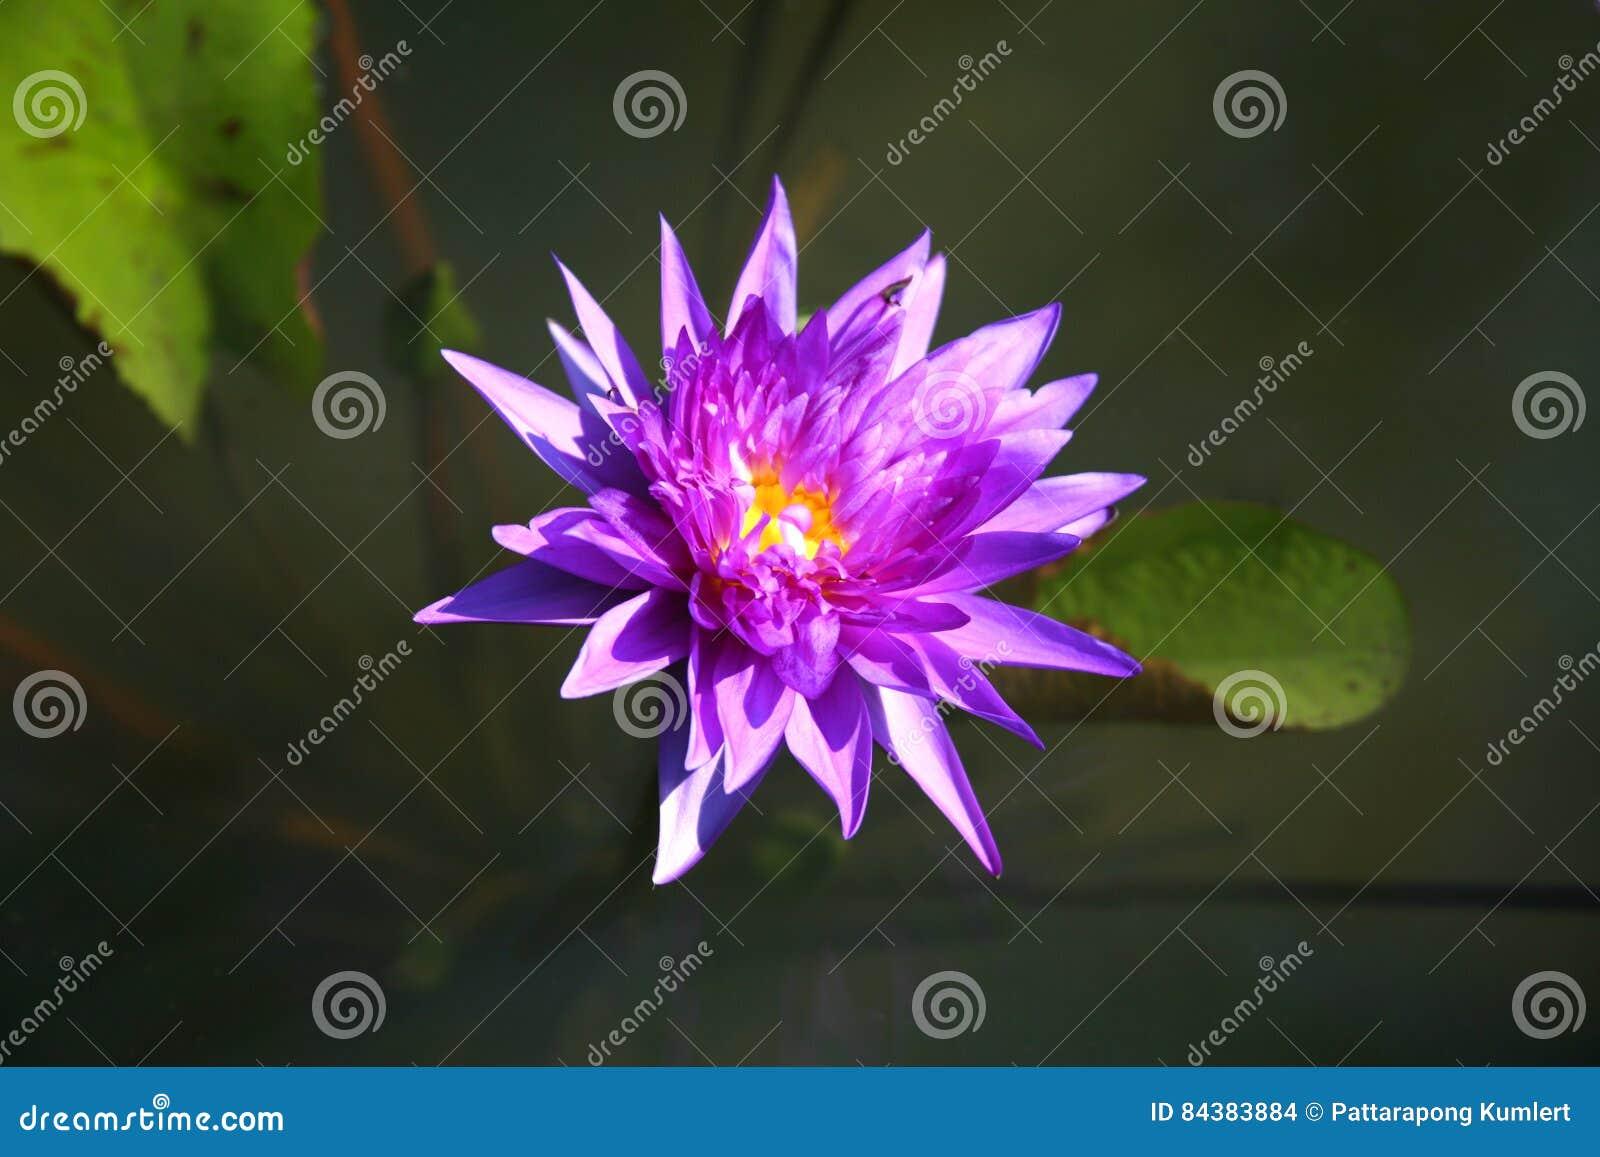 Purple lotus / purple water lily